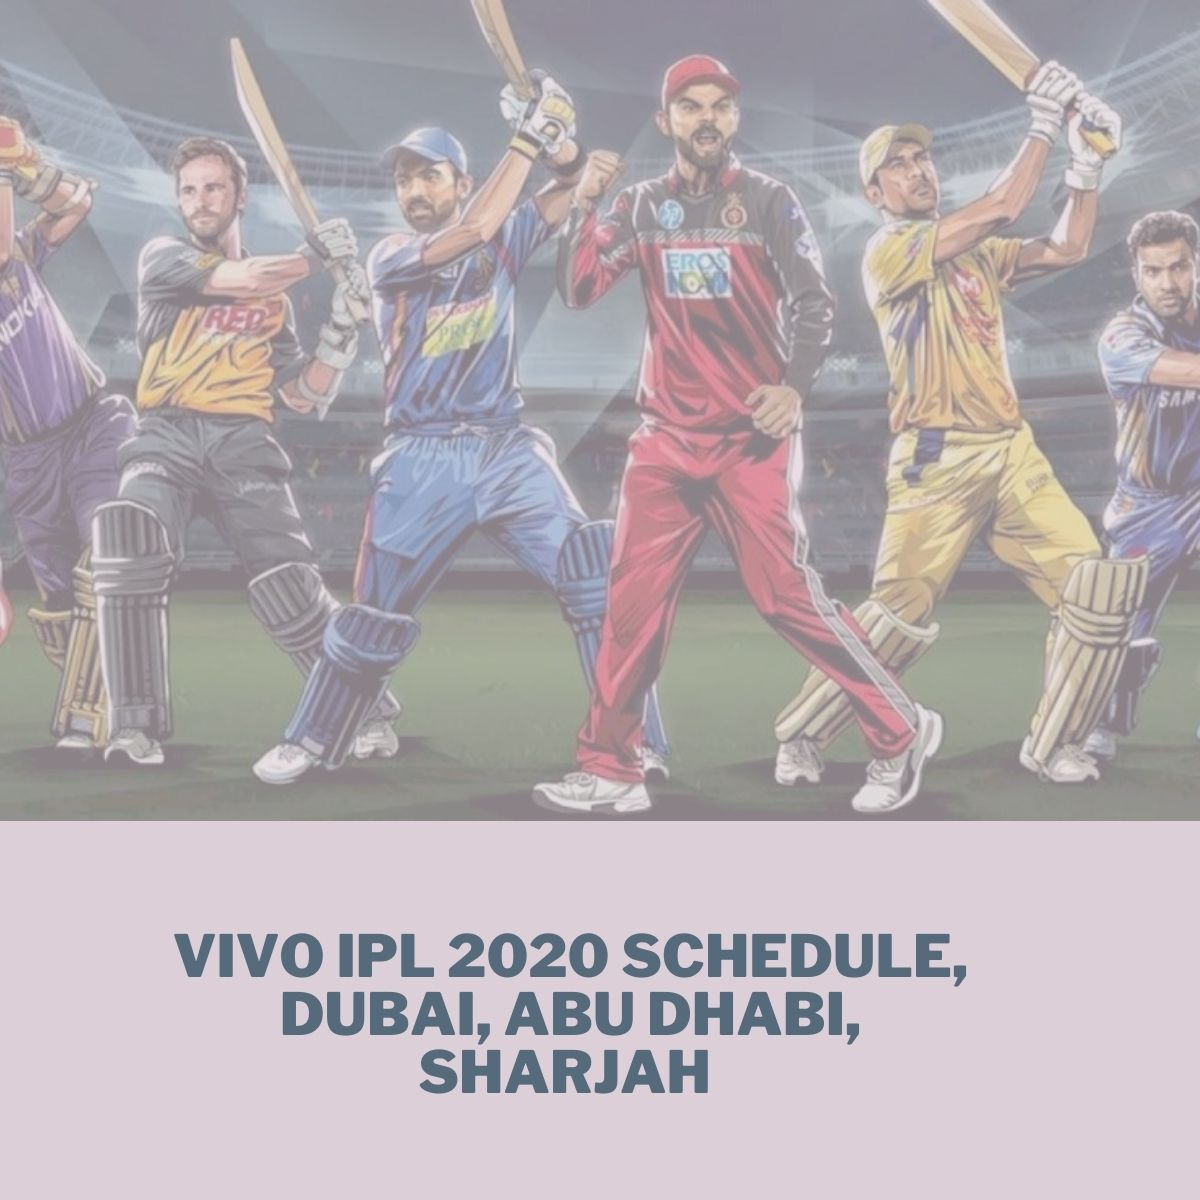 IPL 2020 will be held across all three venues in Dubai, Abu Dhabi and SharjahIPL 2020 will be held across all three venues in Dubai, Abu Dhabi and Sharjah